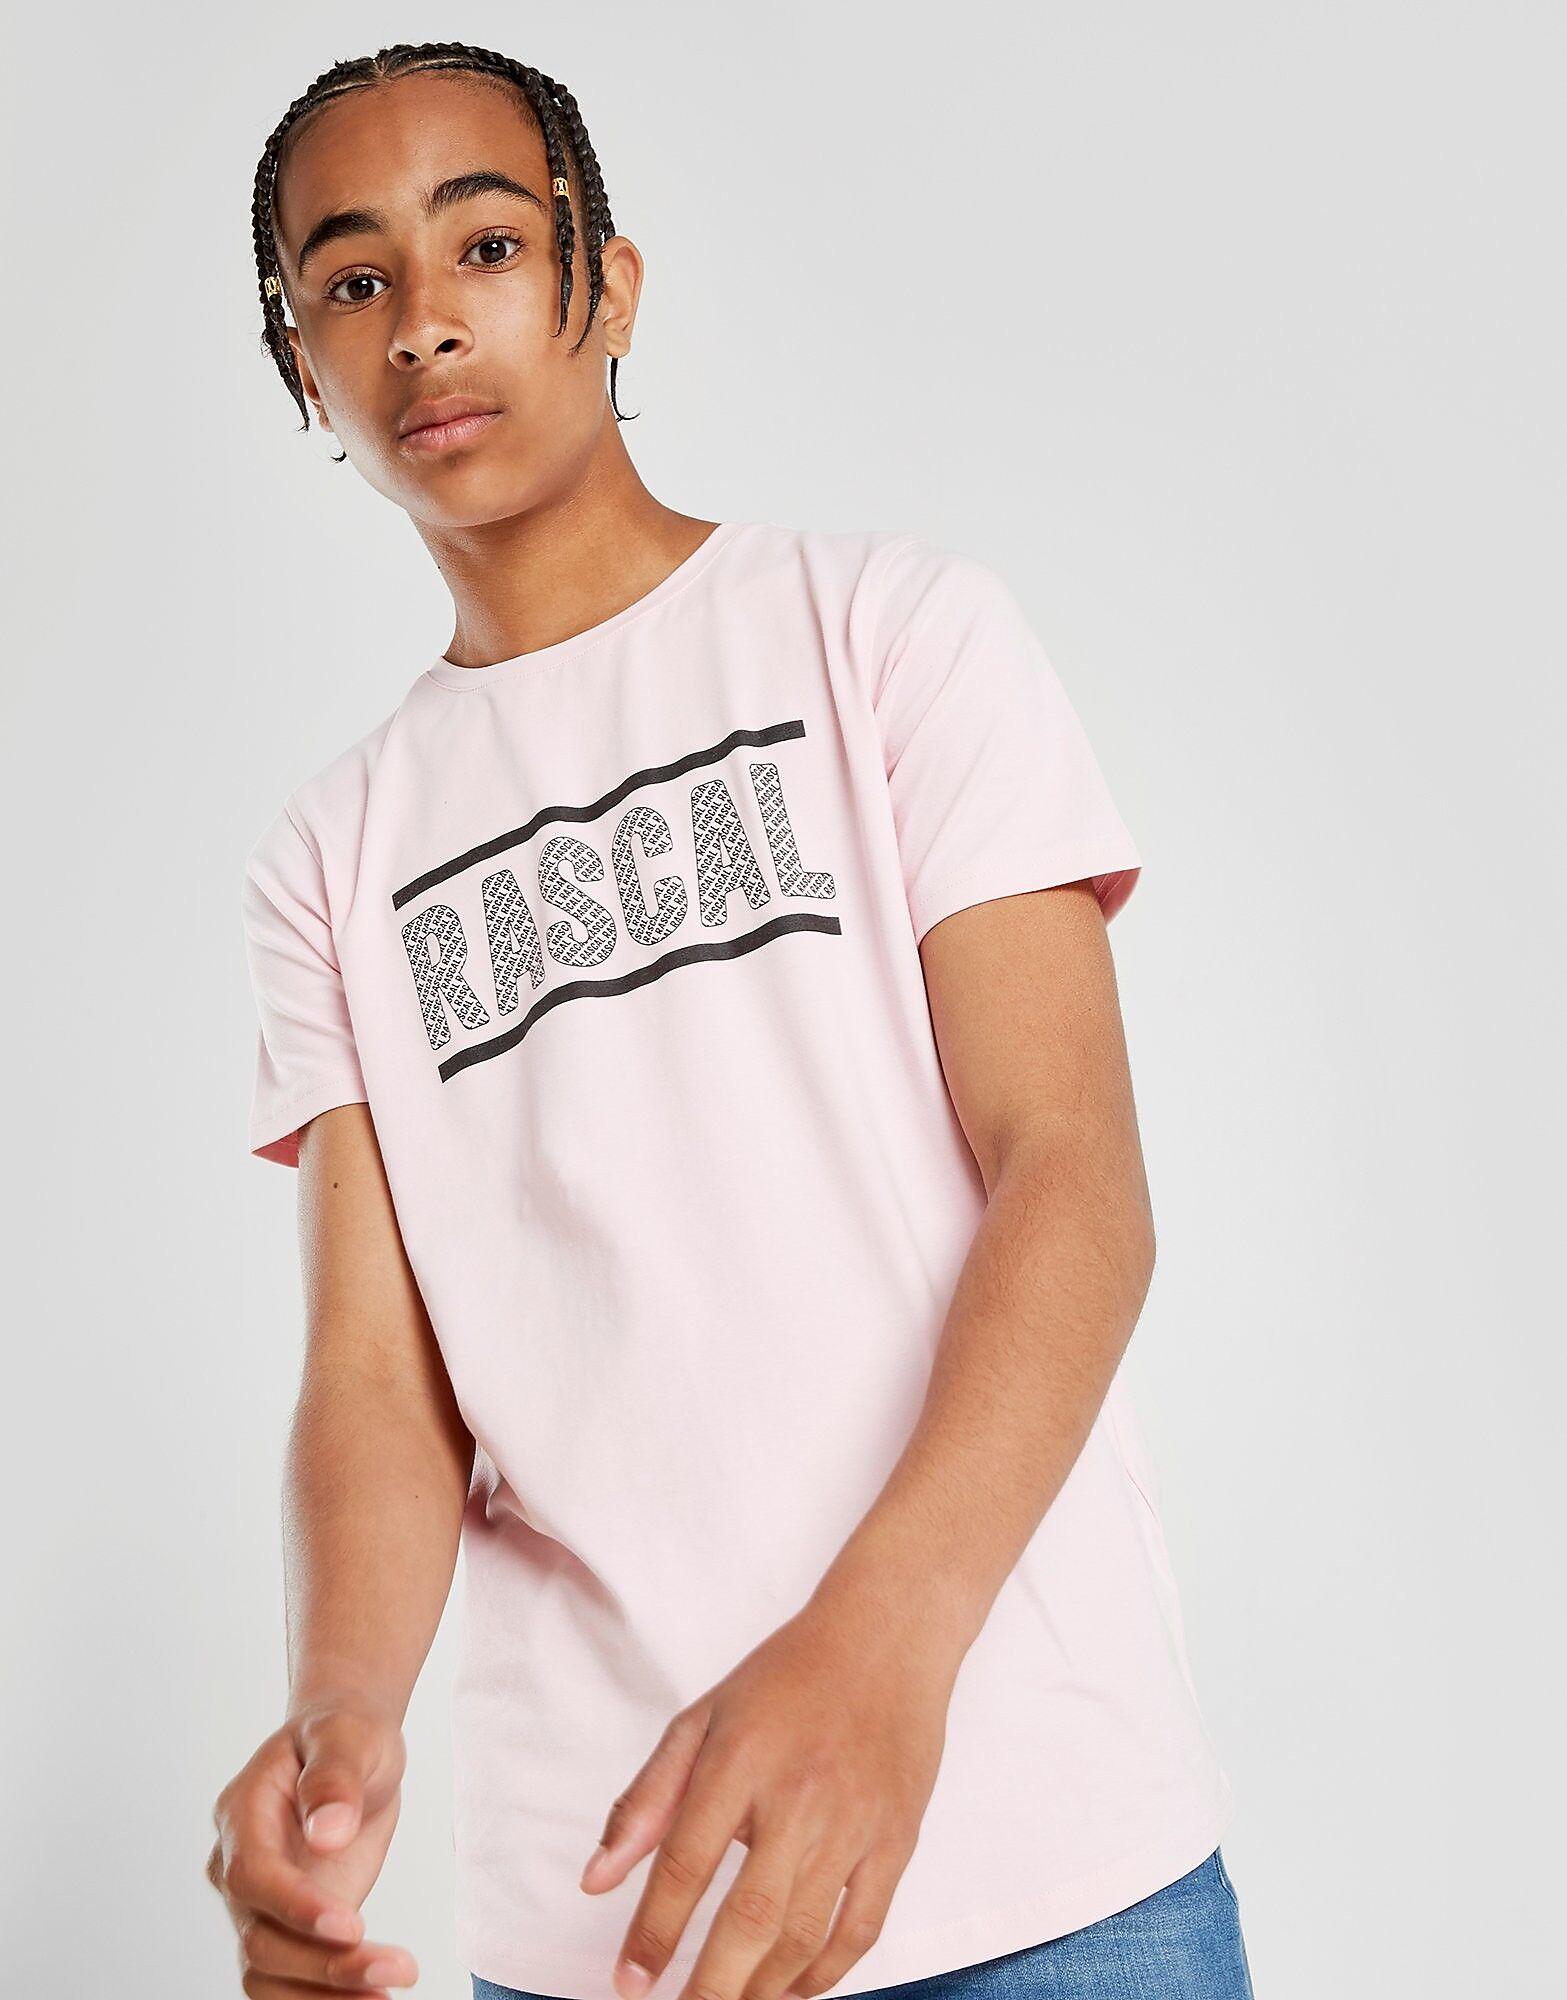 Rascal All Over Print Logo T-Paita Juniorit - Kids, Vaaleanpunainen